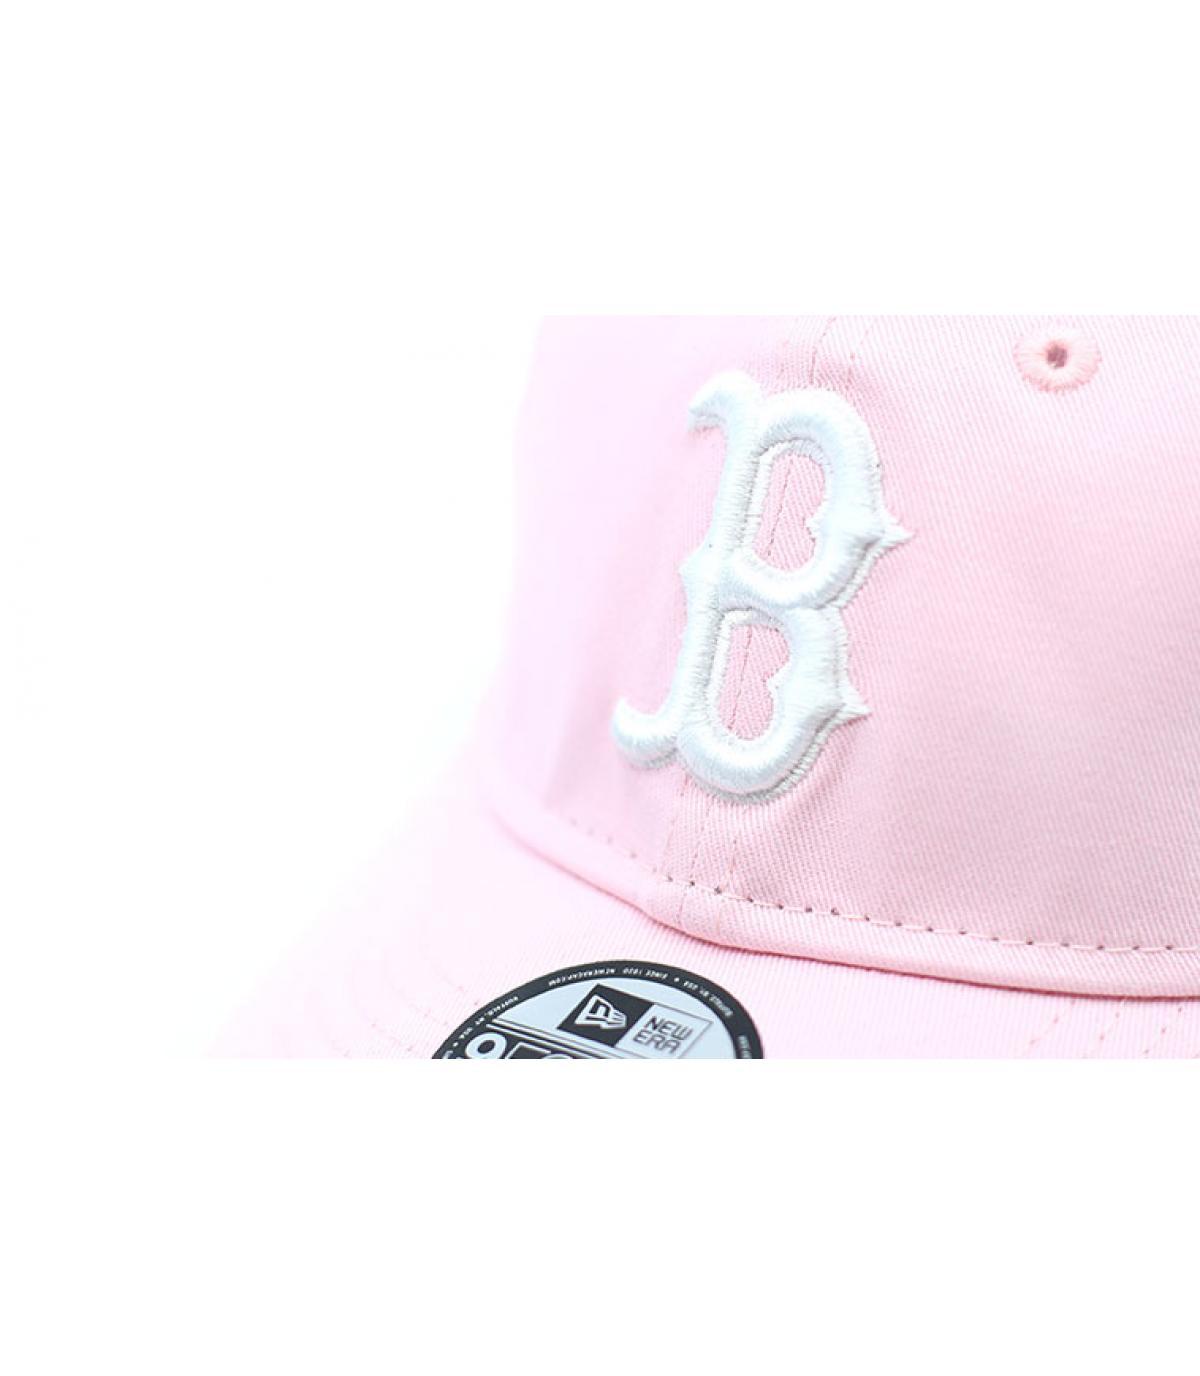 Details Cap League Ess Boston 9Forty pink - Abbildung 3